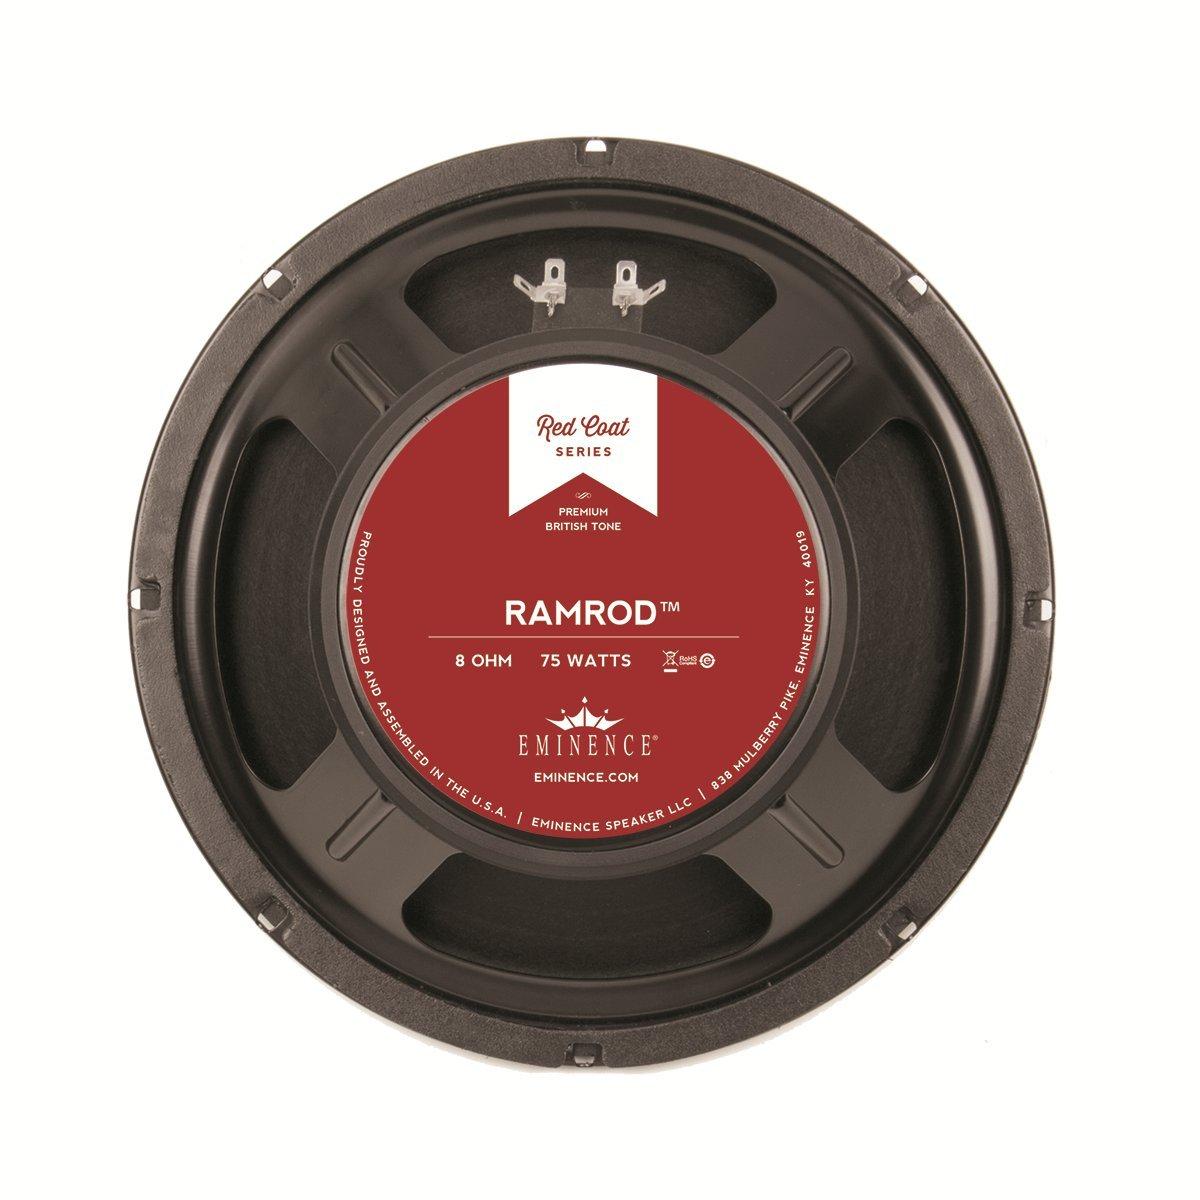 Eminence Red Coat Ramrod 10 Inch Guitar Speaker 75 Watts - (8 Ohm)